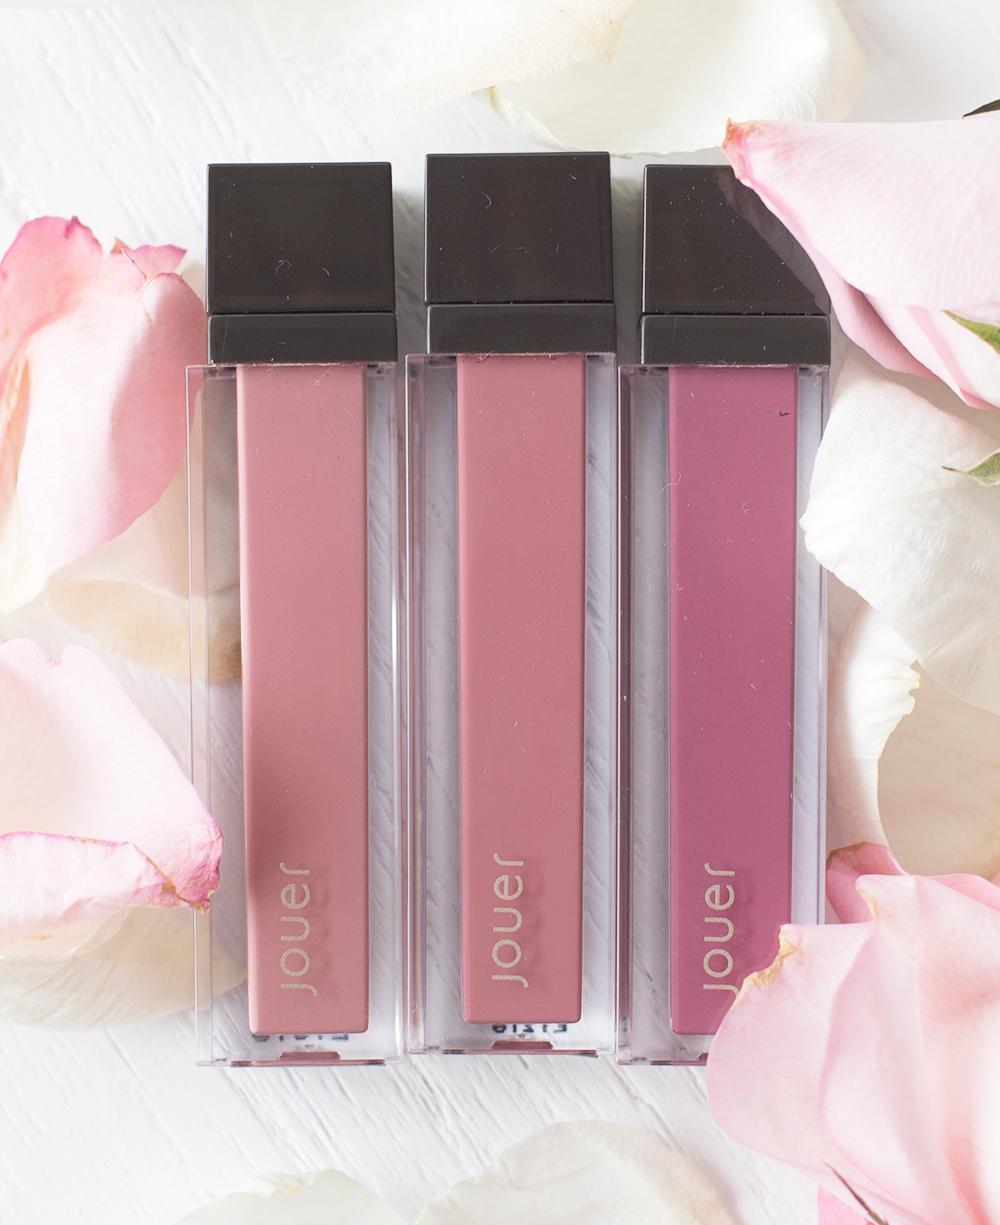 Jouer Cosmetics Long Wear Lip Creme Liquid Lipstick Trio